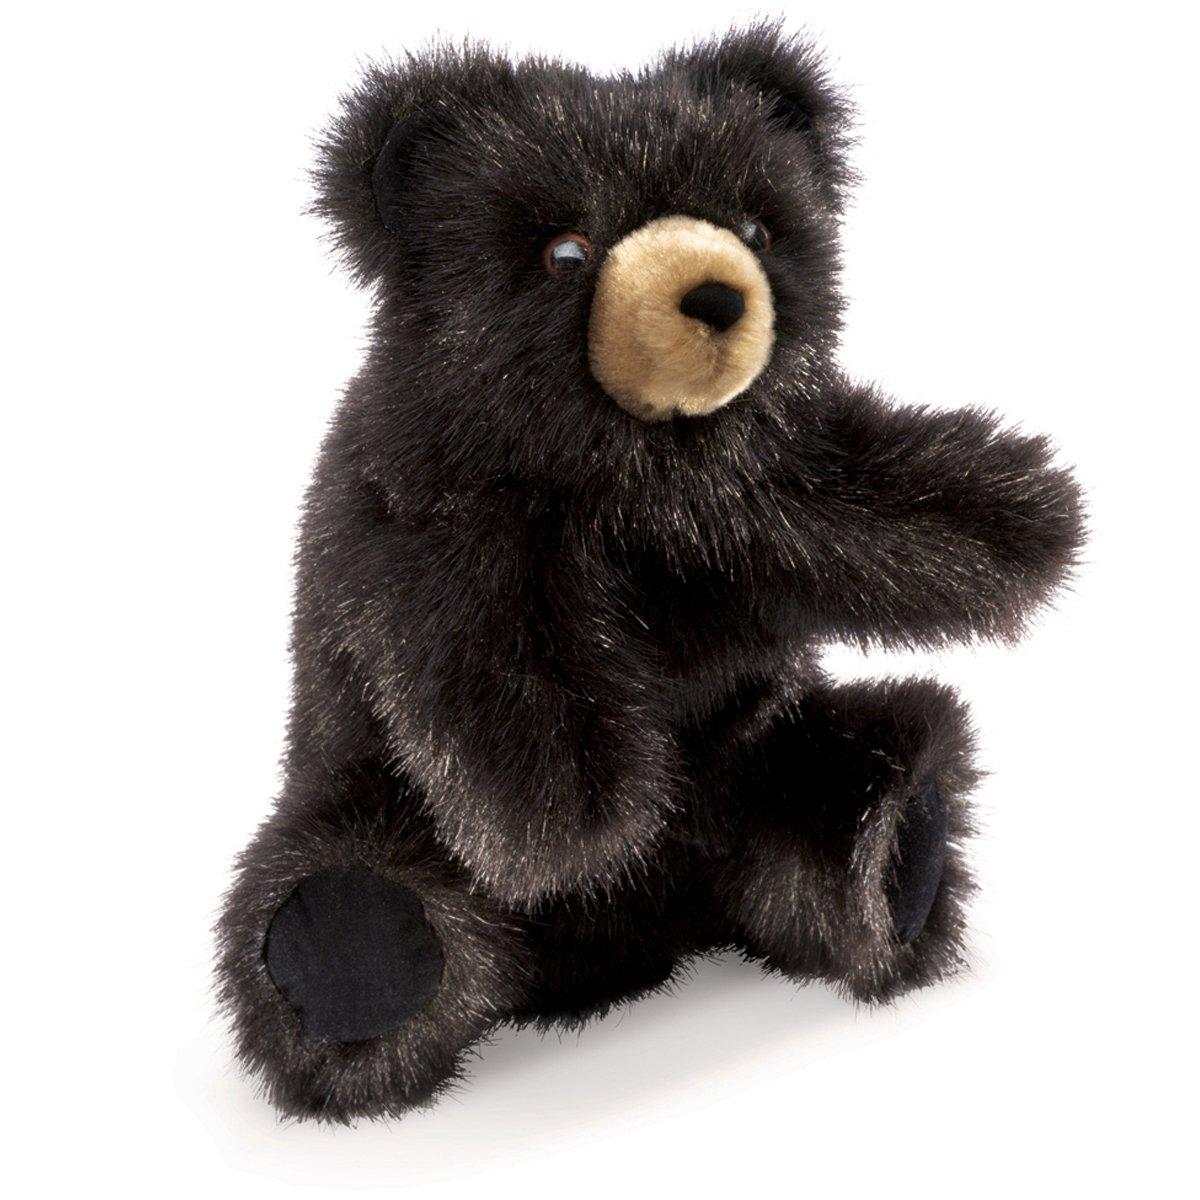 Folkmanis Baby Black Bear Hand Puppet Folkmanis Inc. 2232 0638348022325 Bears